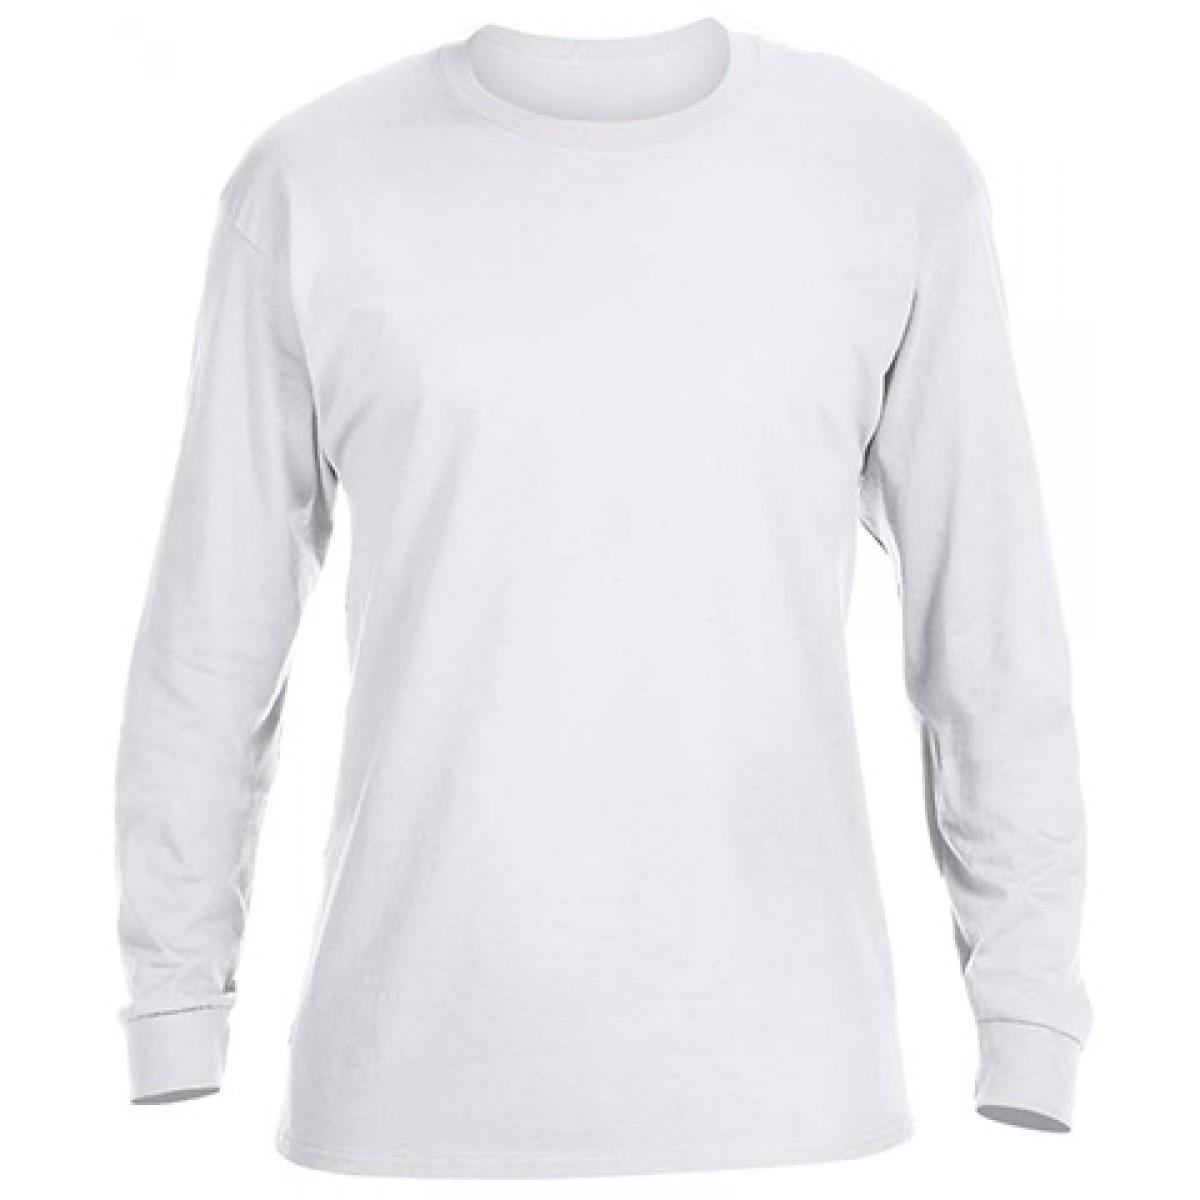 Basic Long Sleeve Crew Neck -White-S